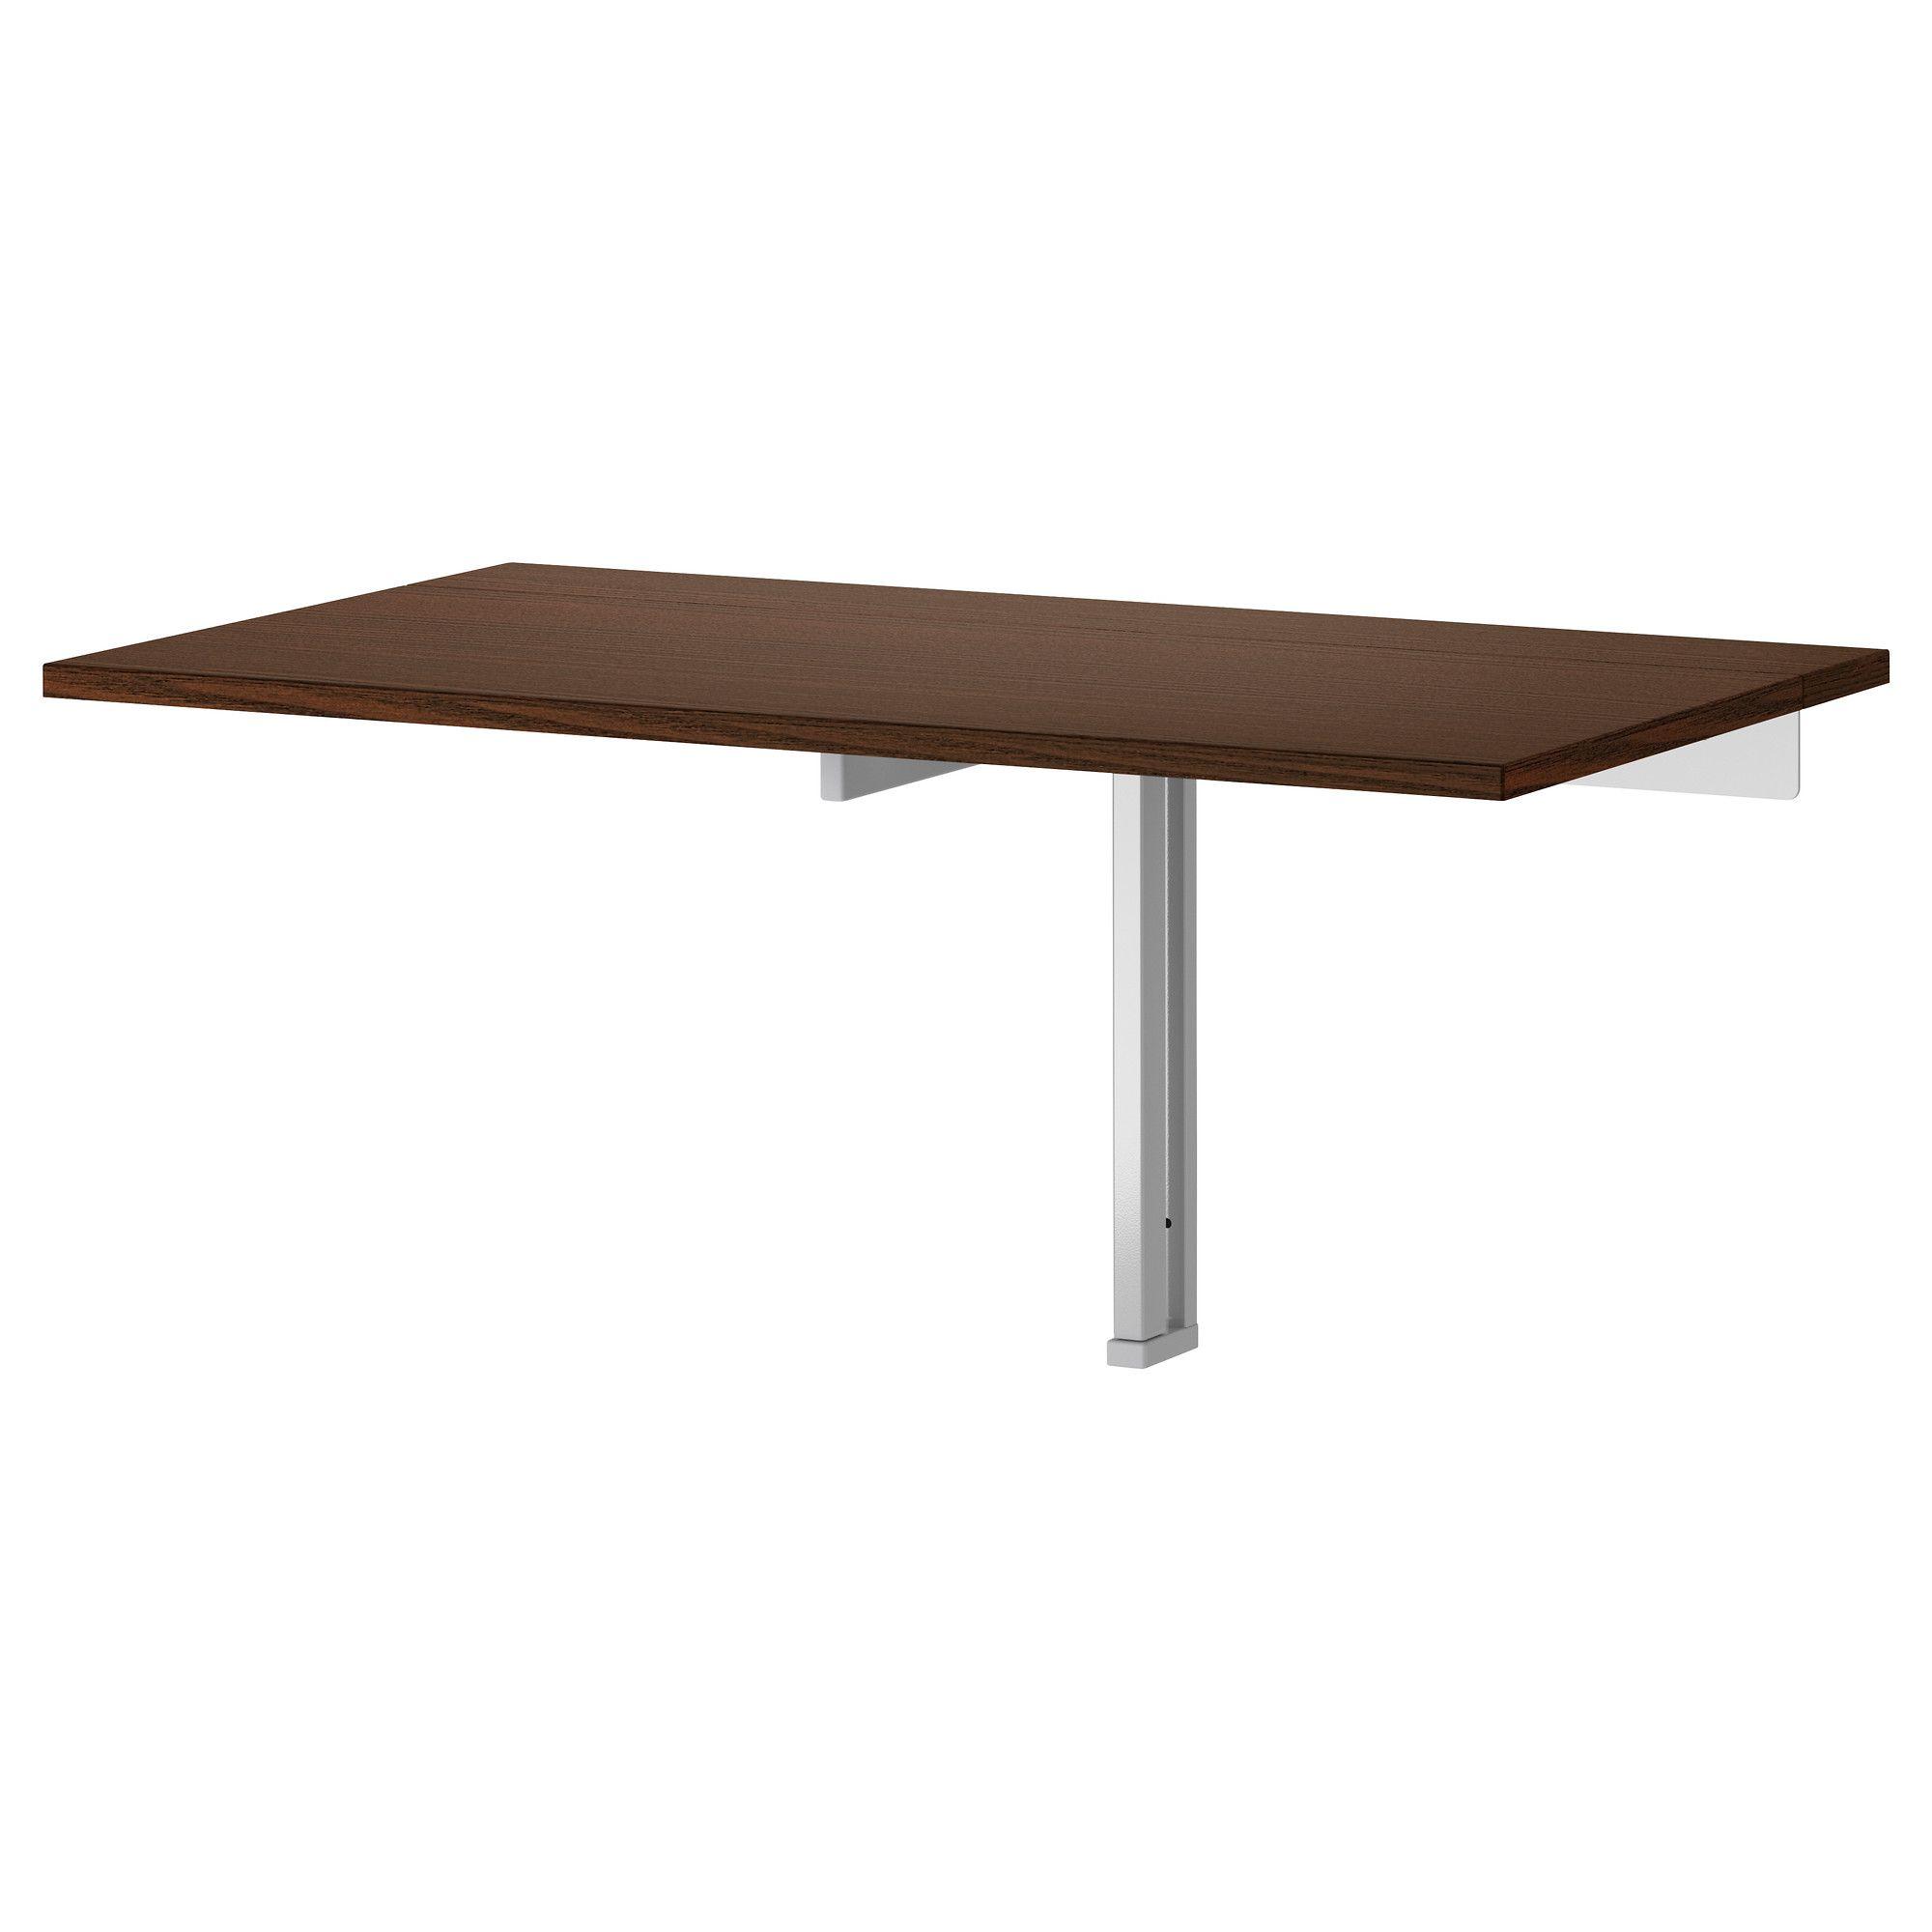 Ikea bjursta tavolo ribaltabile da parete quando il - Tavolo ribaltabile da parete ikea ...